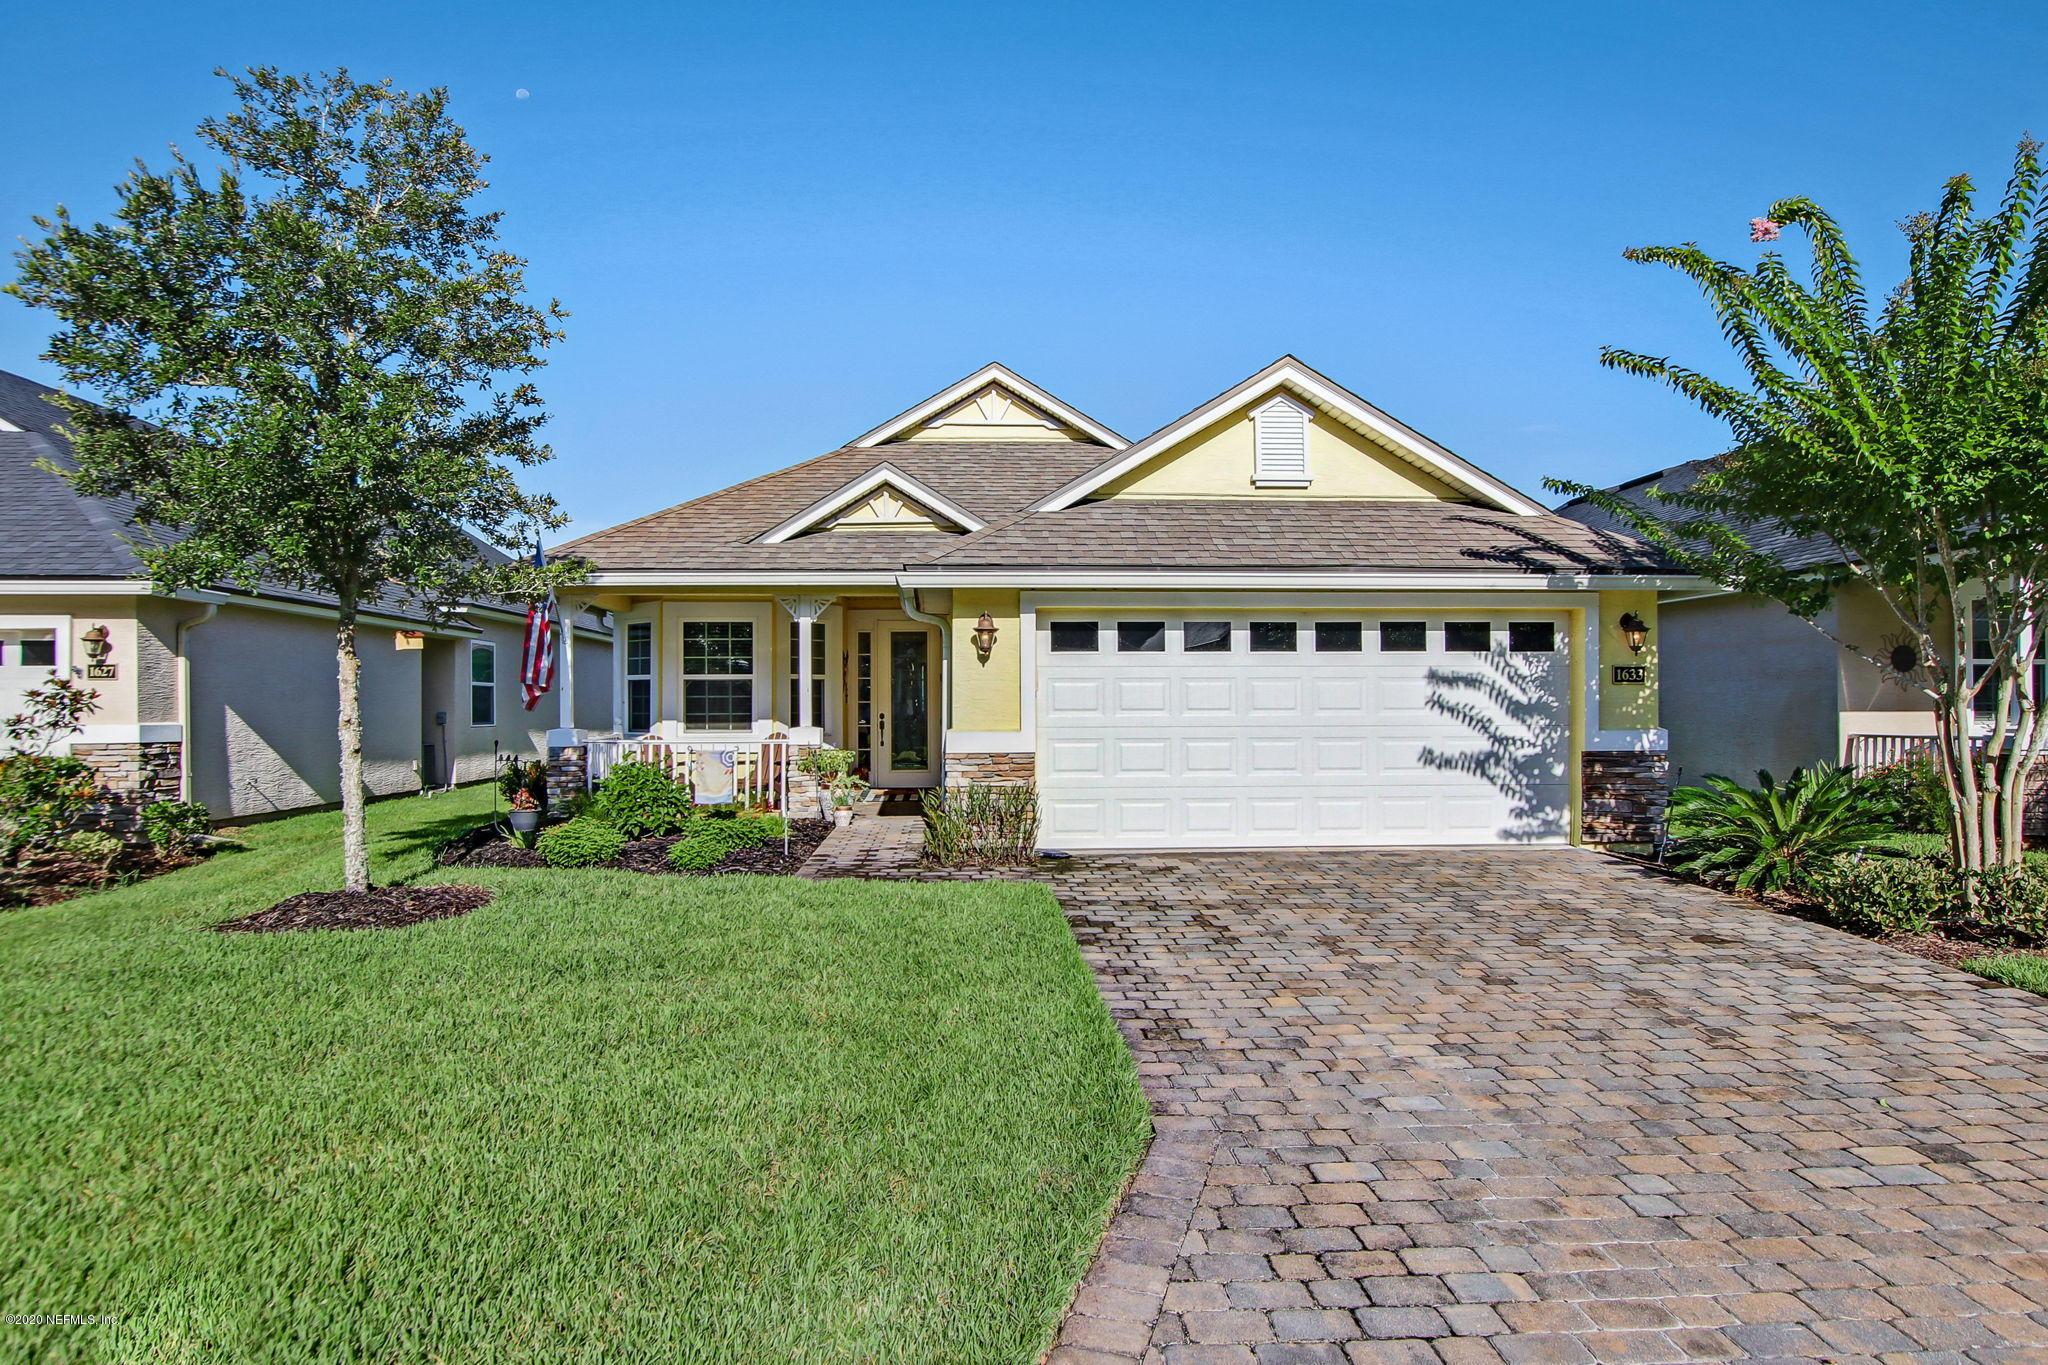 1633 SUGAR LOAF, ST AUGUSTINE, FLORIDA 32092, 3 Bedrooms Bedrooms, ,2 BathroomsBathrooms,Residential,For sale,SUGAR LOAF,1067558